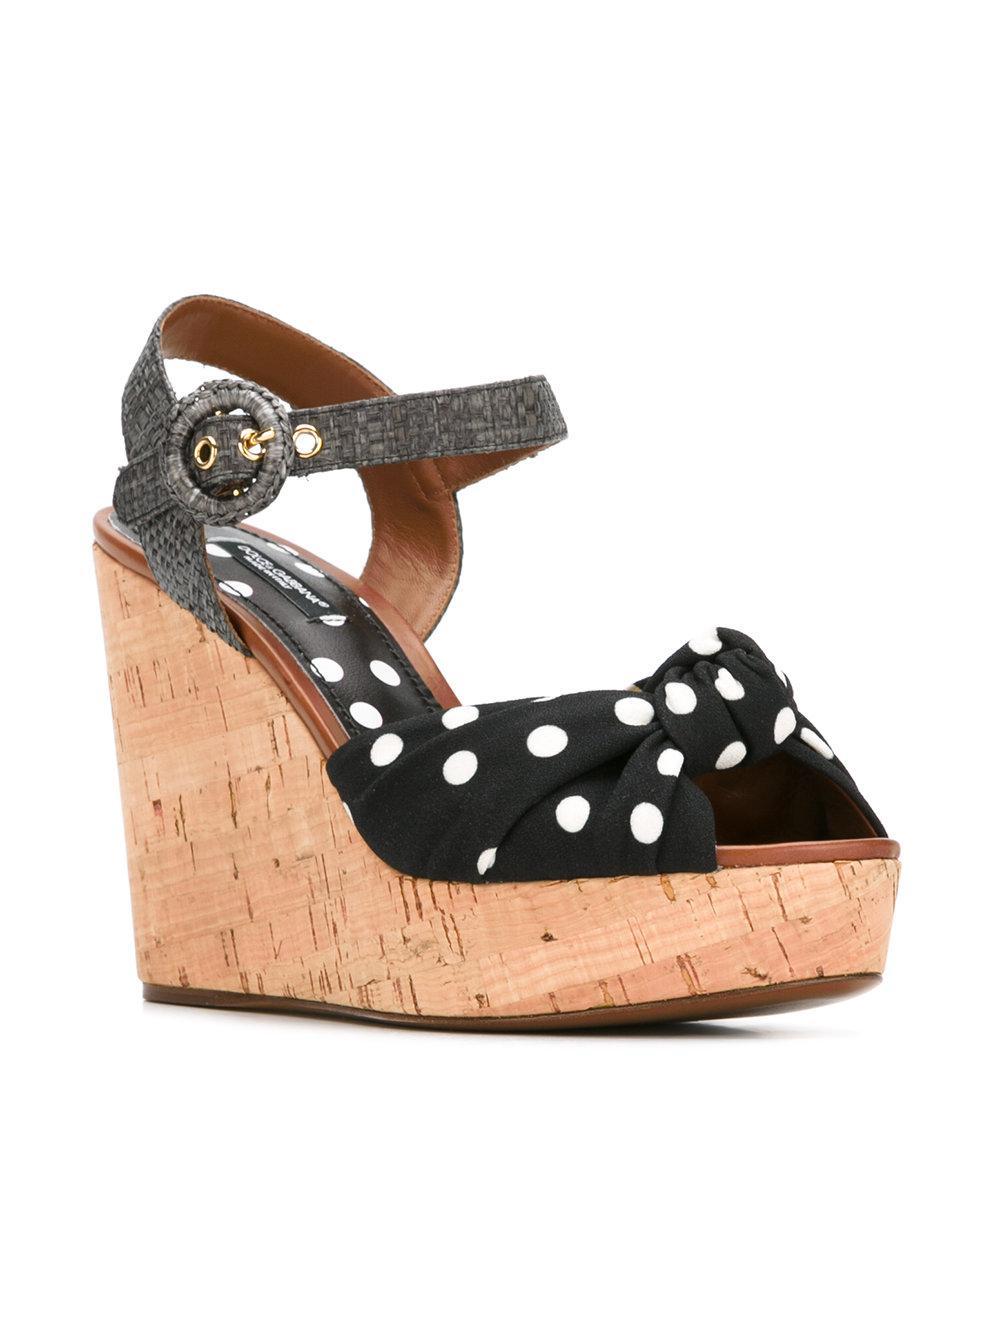 c57a468283d2 Dolce   Gabbana Polka-dot Wedge Sandals in Black - Save 60.66115702479339%  - Lyst